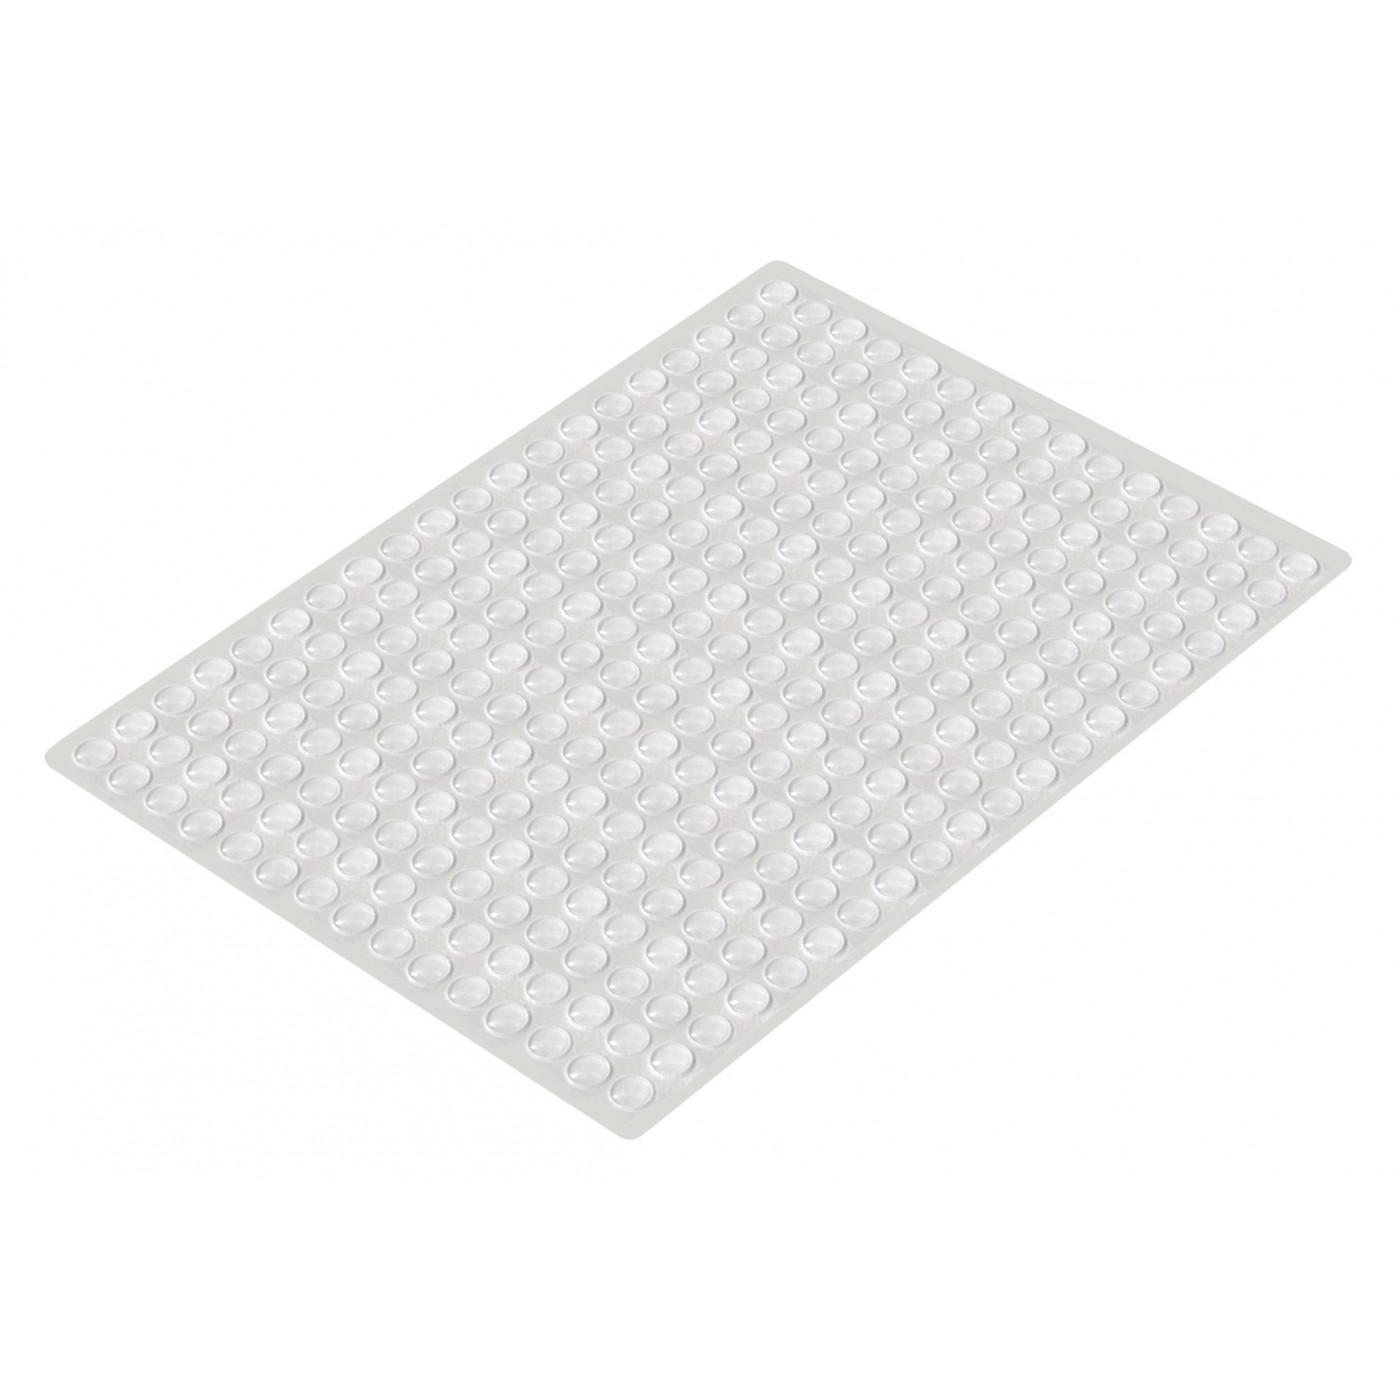 Set of 300 self adhesive buffers (type 1, 8.0x1.5 mm)